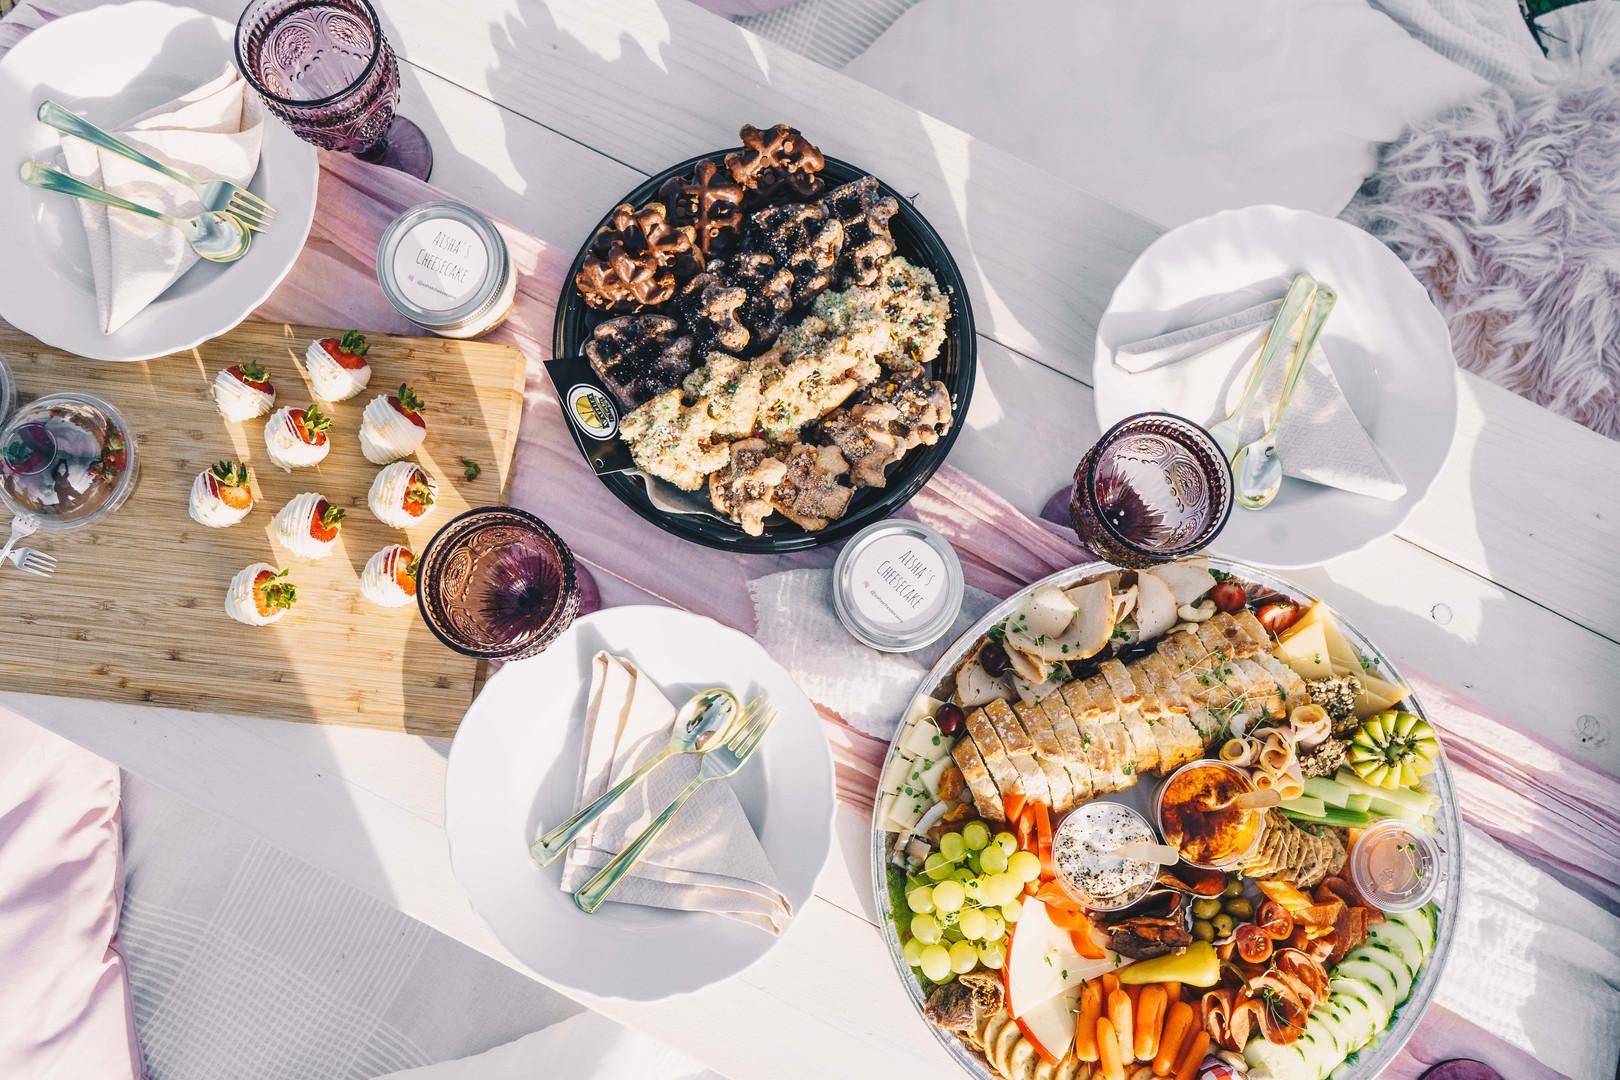 Food Platters from @gouda.thyme & @wafflesinthe6ix